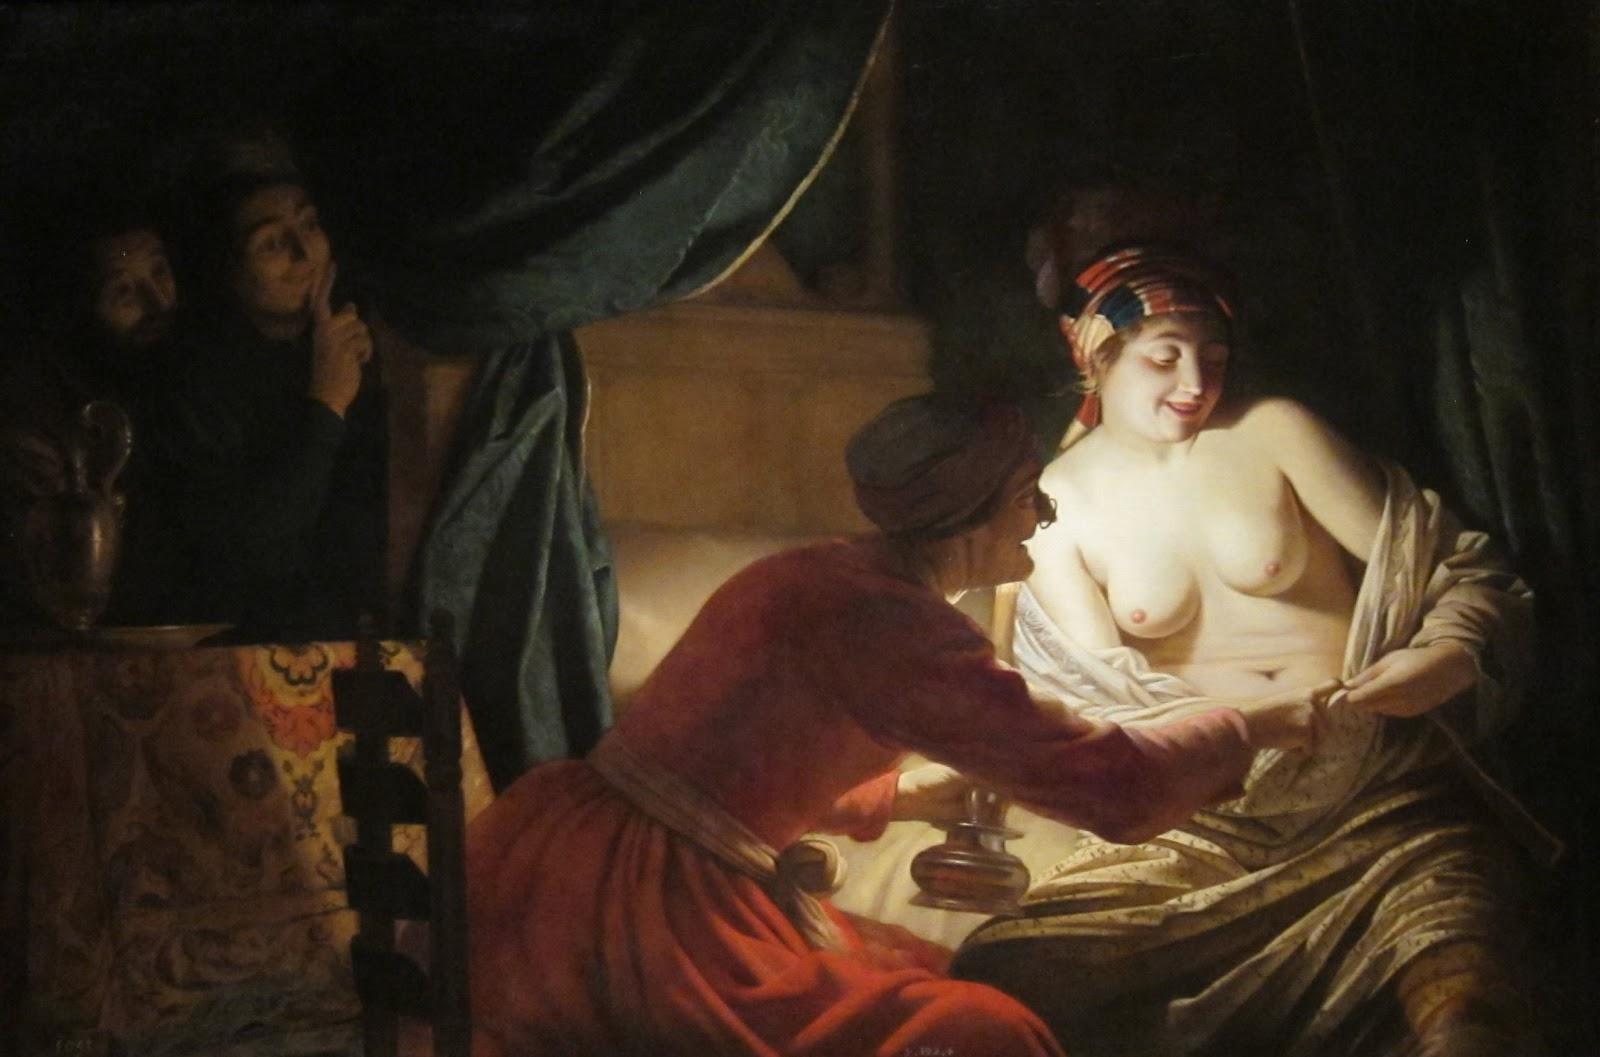 Эротика при королях в старину фото 377-512